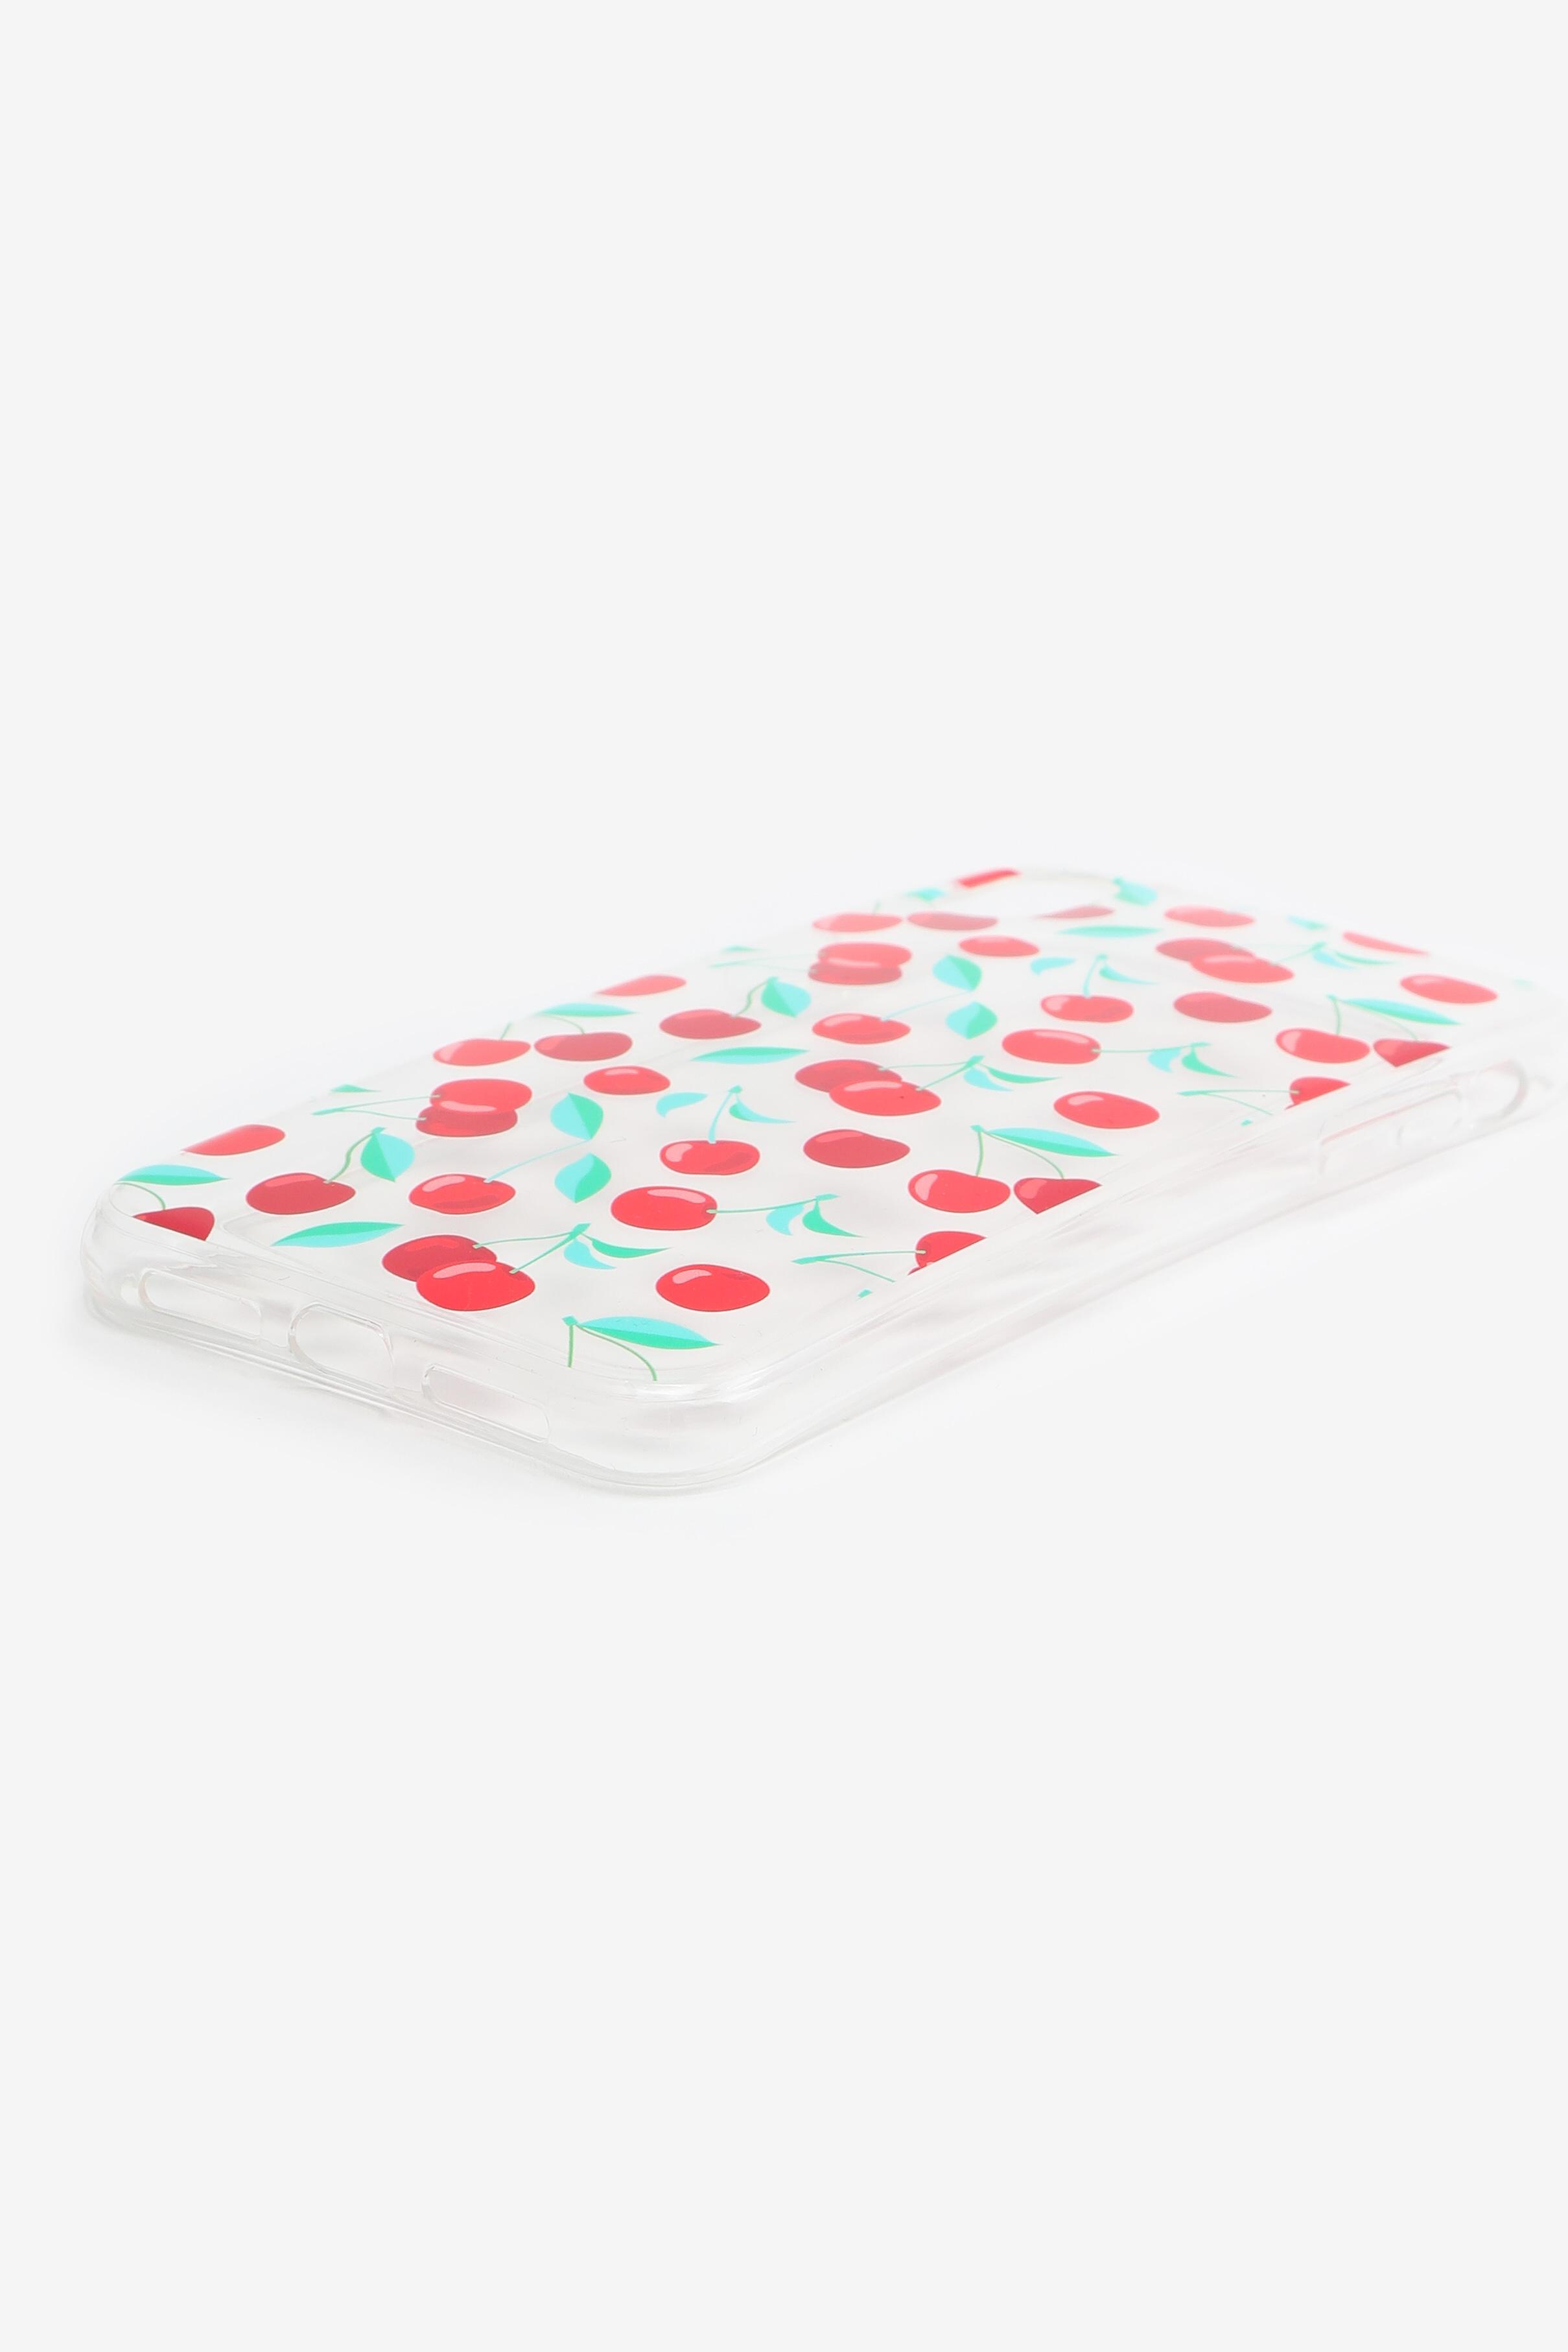 Cherry iPhone XR Case